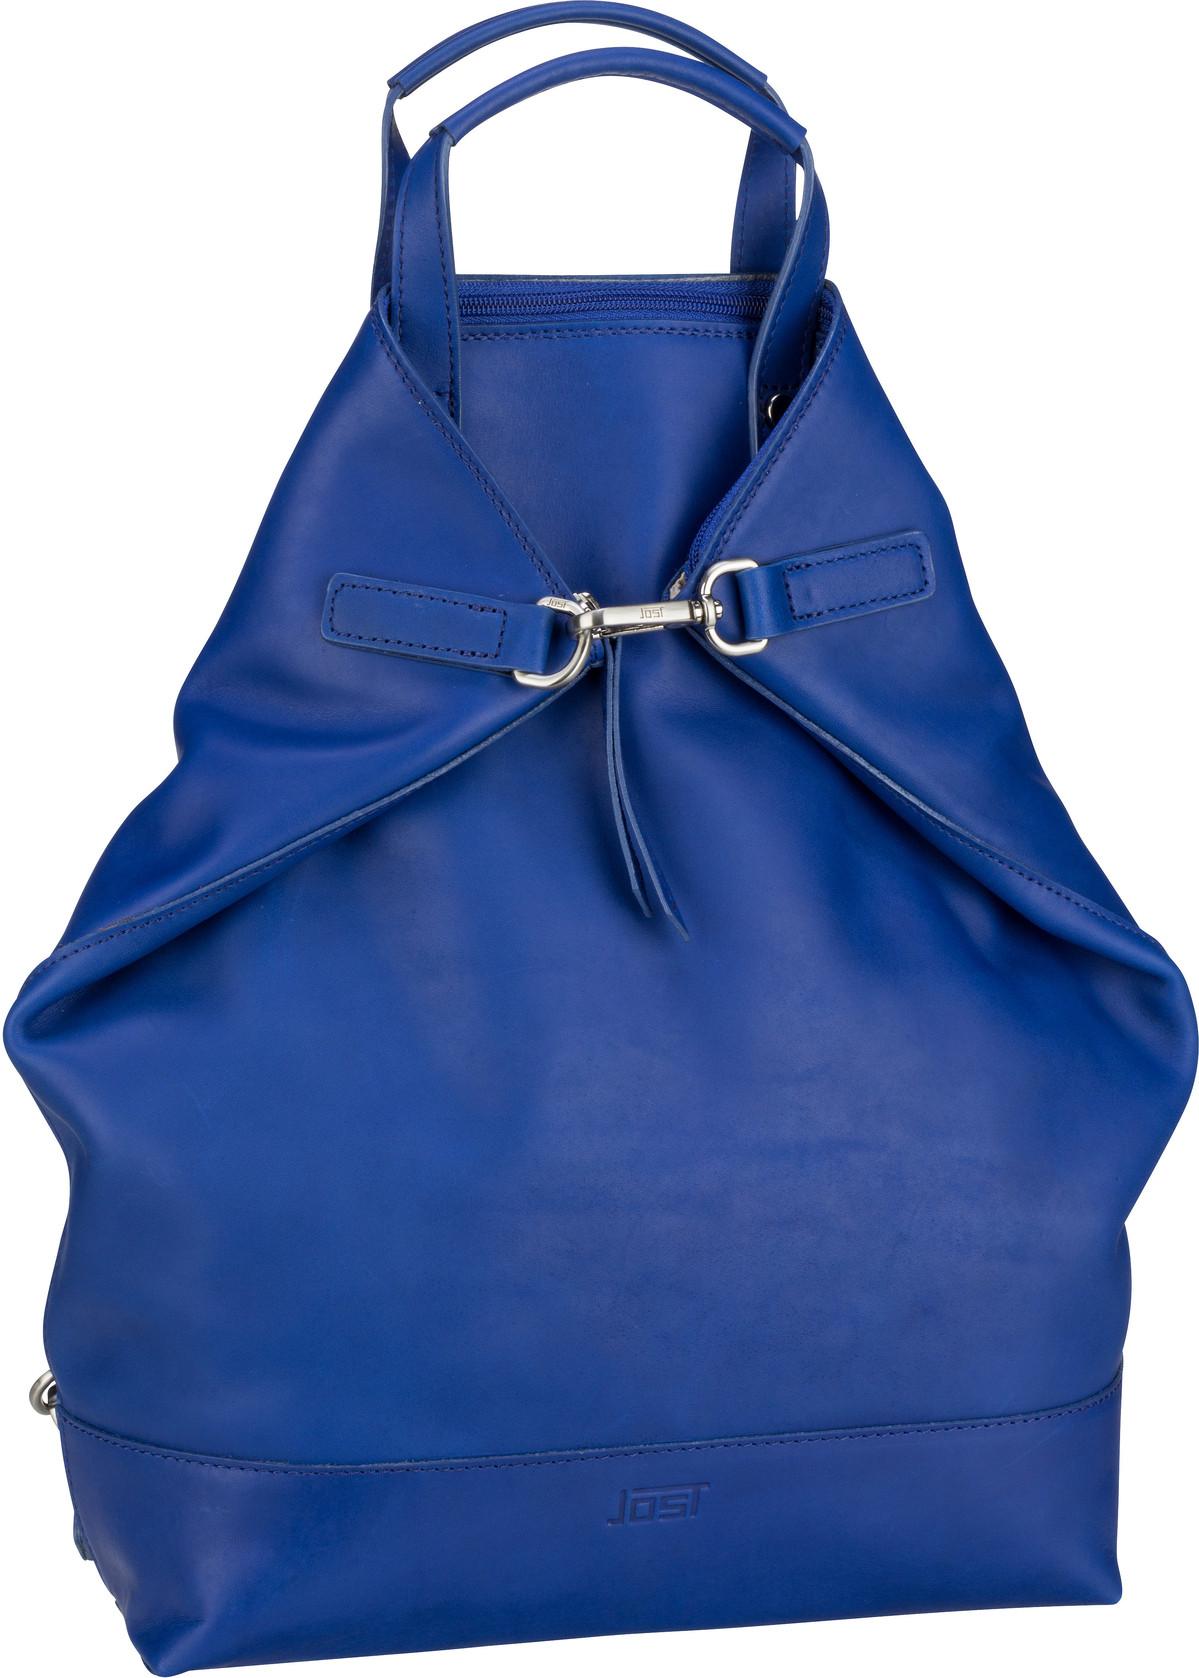 Rucksack / Daypack Rana 1207 X-Change 3in1 Bag S Royalblue